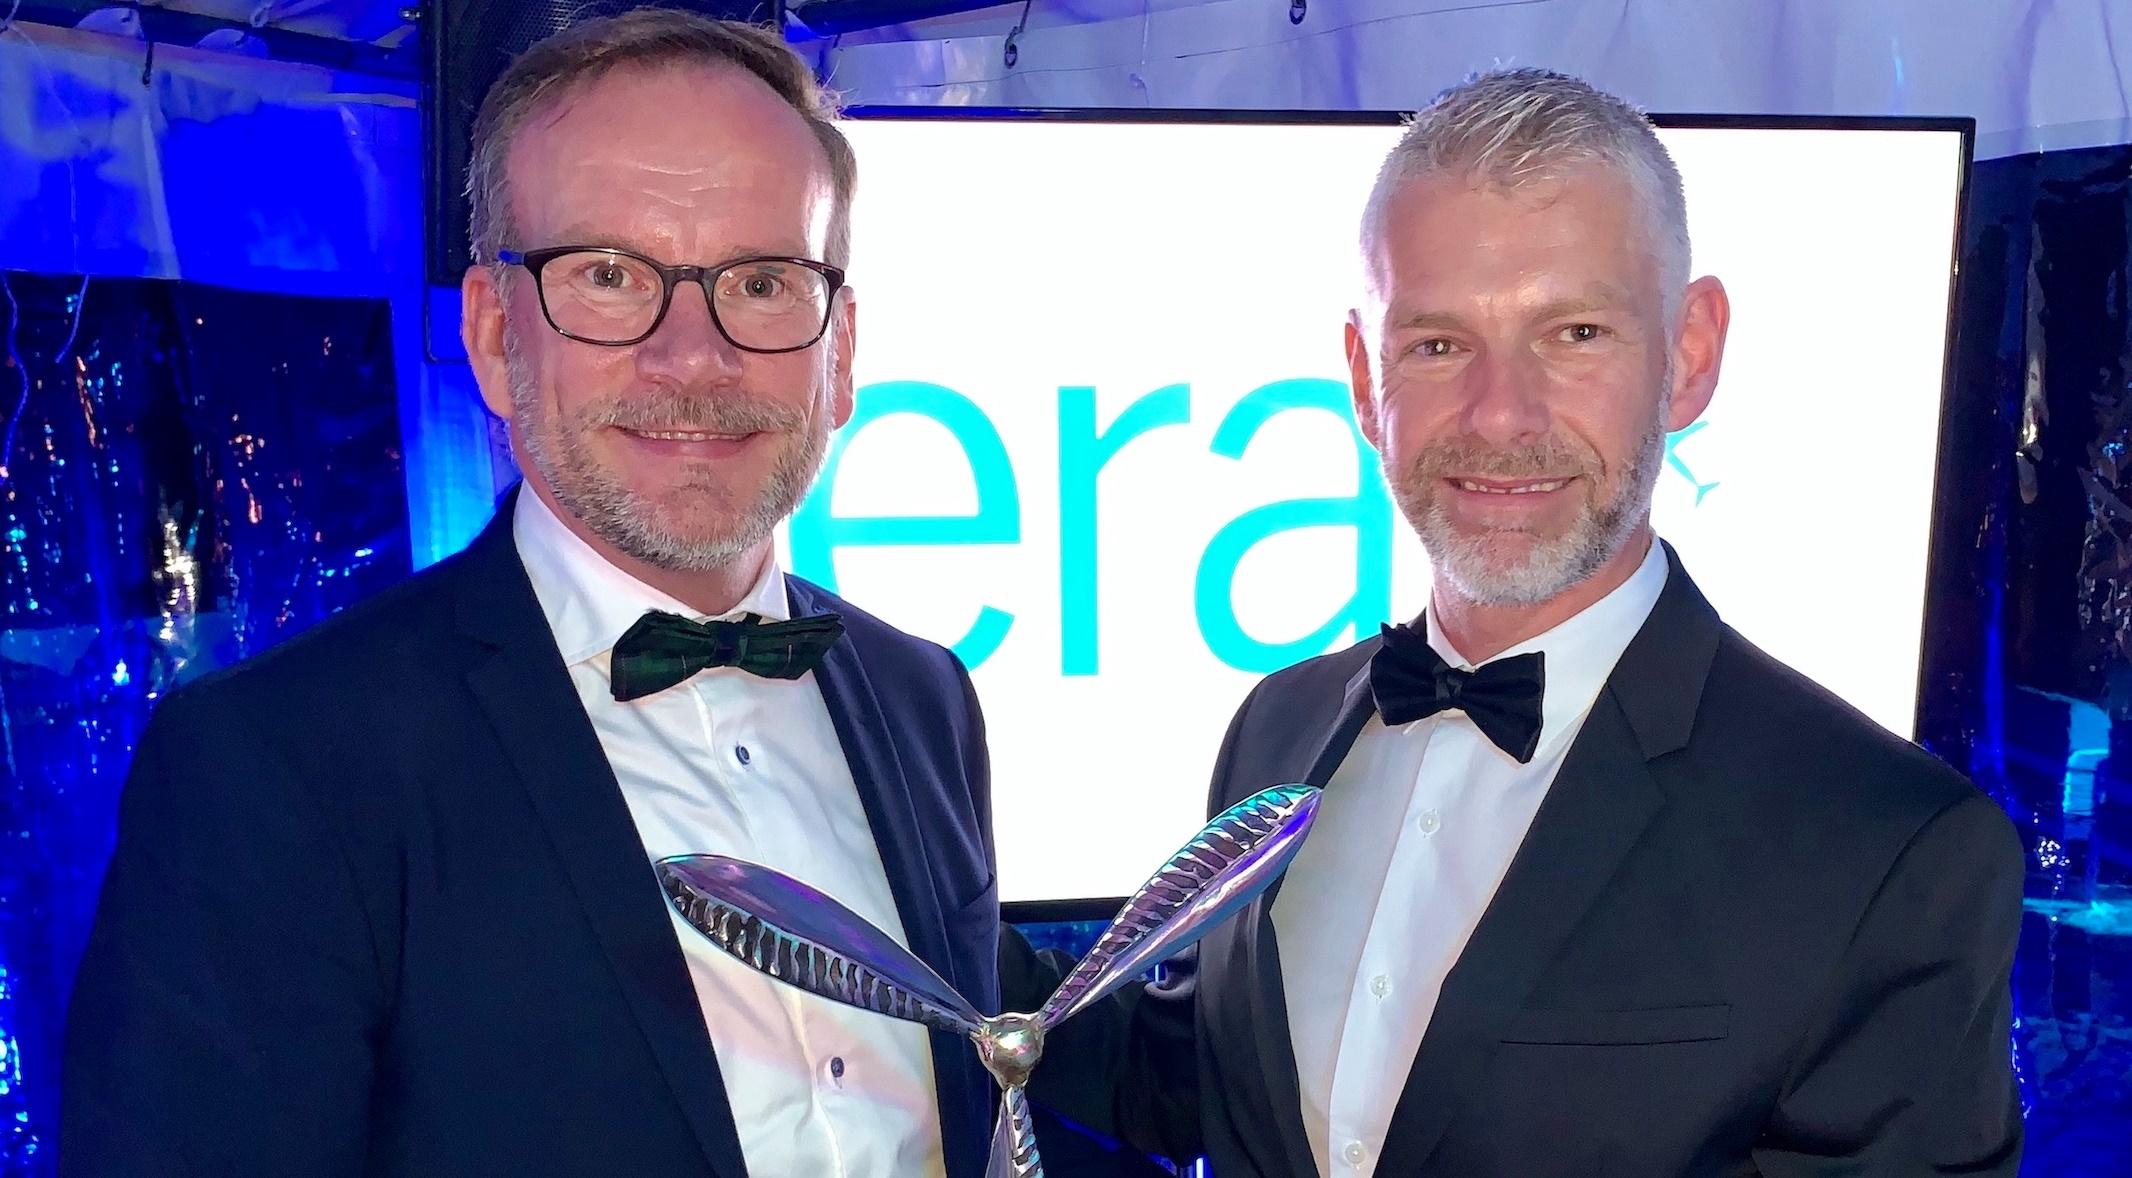 Administrerende direktør, Peer H. Kristensen, og Head of Airline Relations, David Surley, i Aarhus Lufthavn modtog en 'Airport of the Year Award' ved ERAs generalforsamling i Frankrig. (Foro: Aarhus Airport | PR)